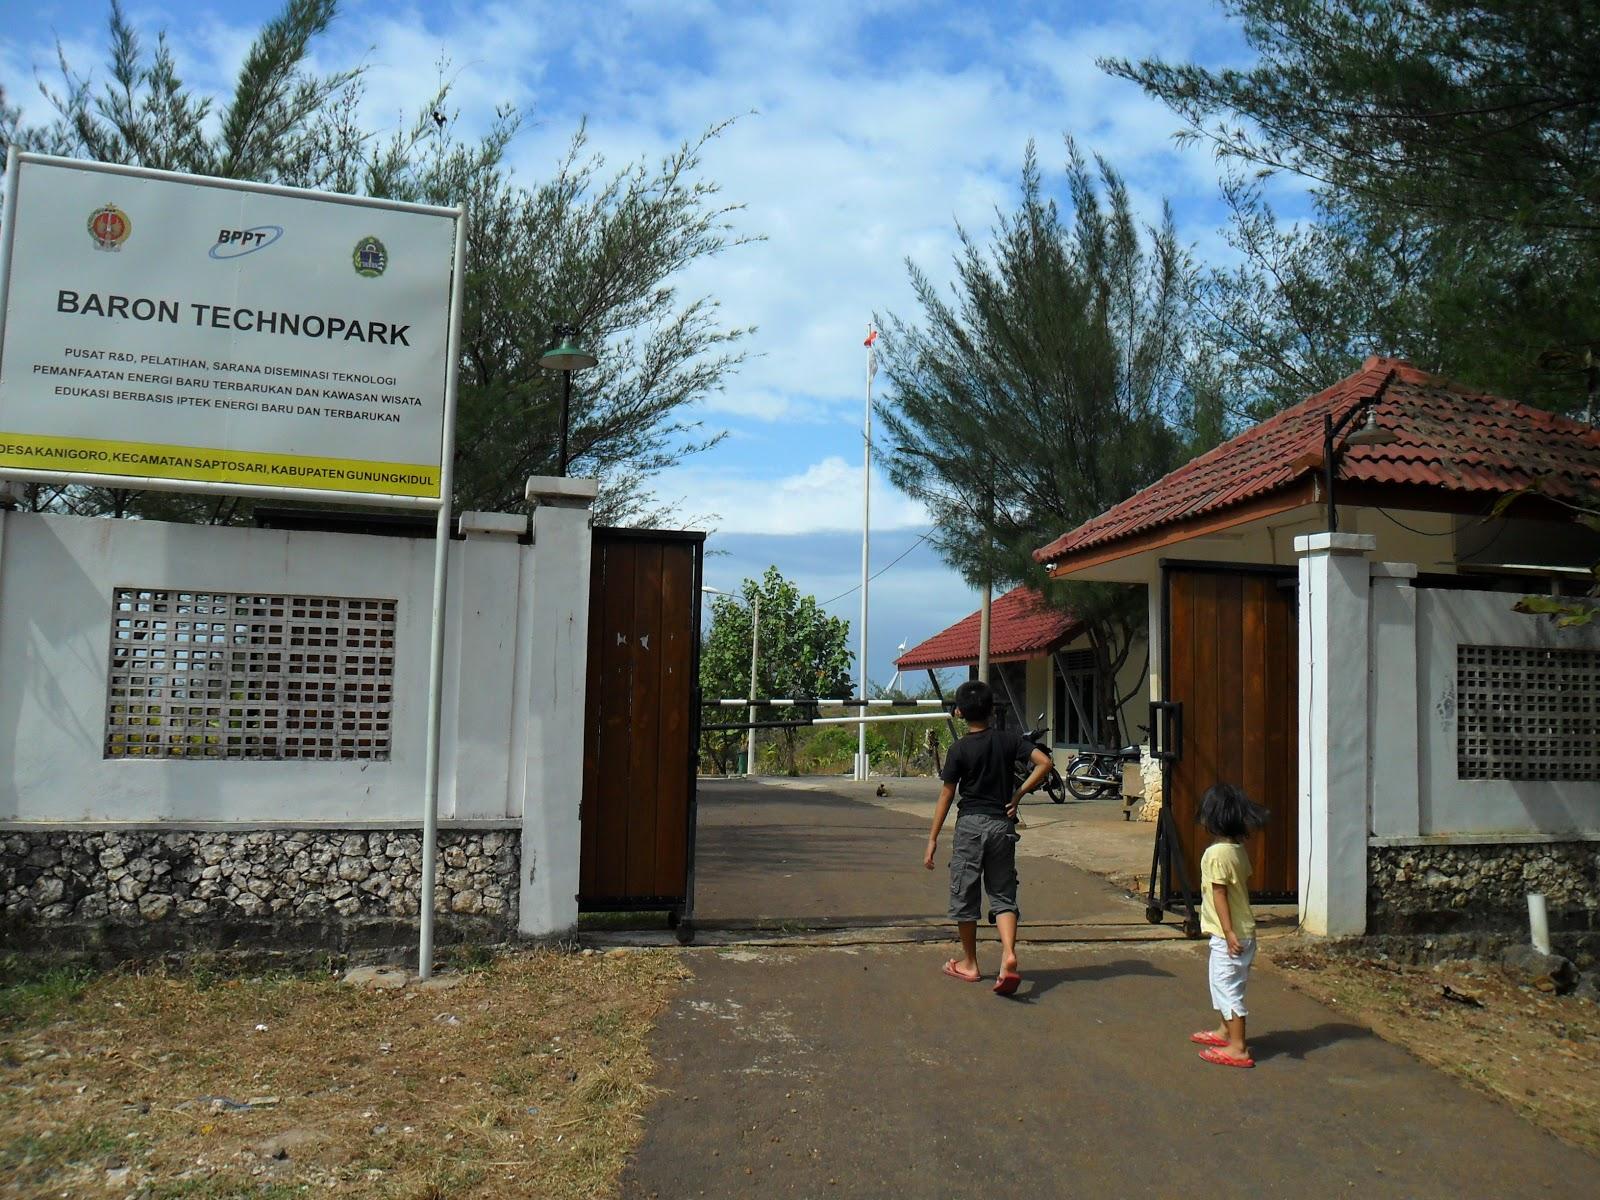 Pengalaman Maen Baron Technopark Gunung Kidul Coretanbunda Kab Gunungkidul